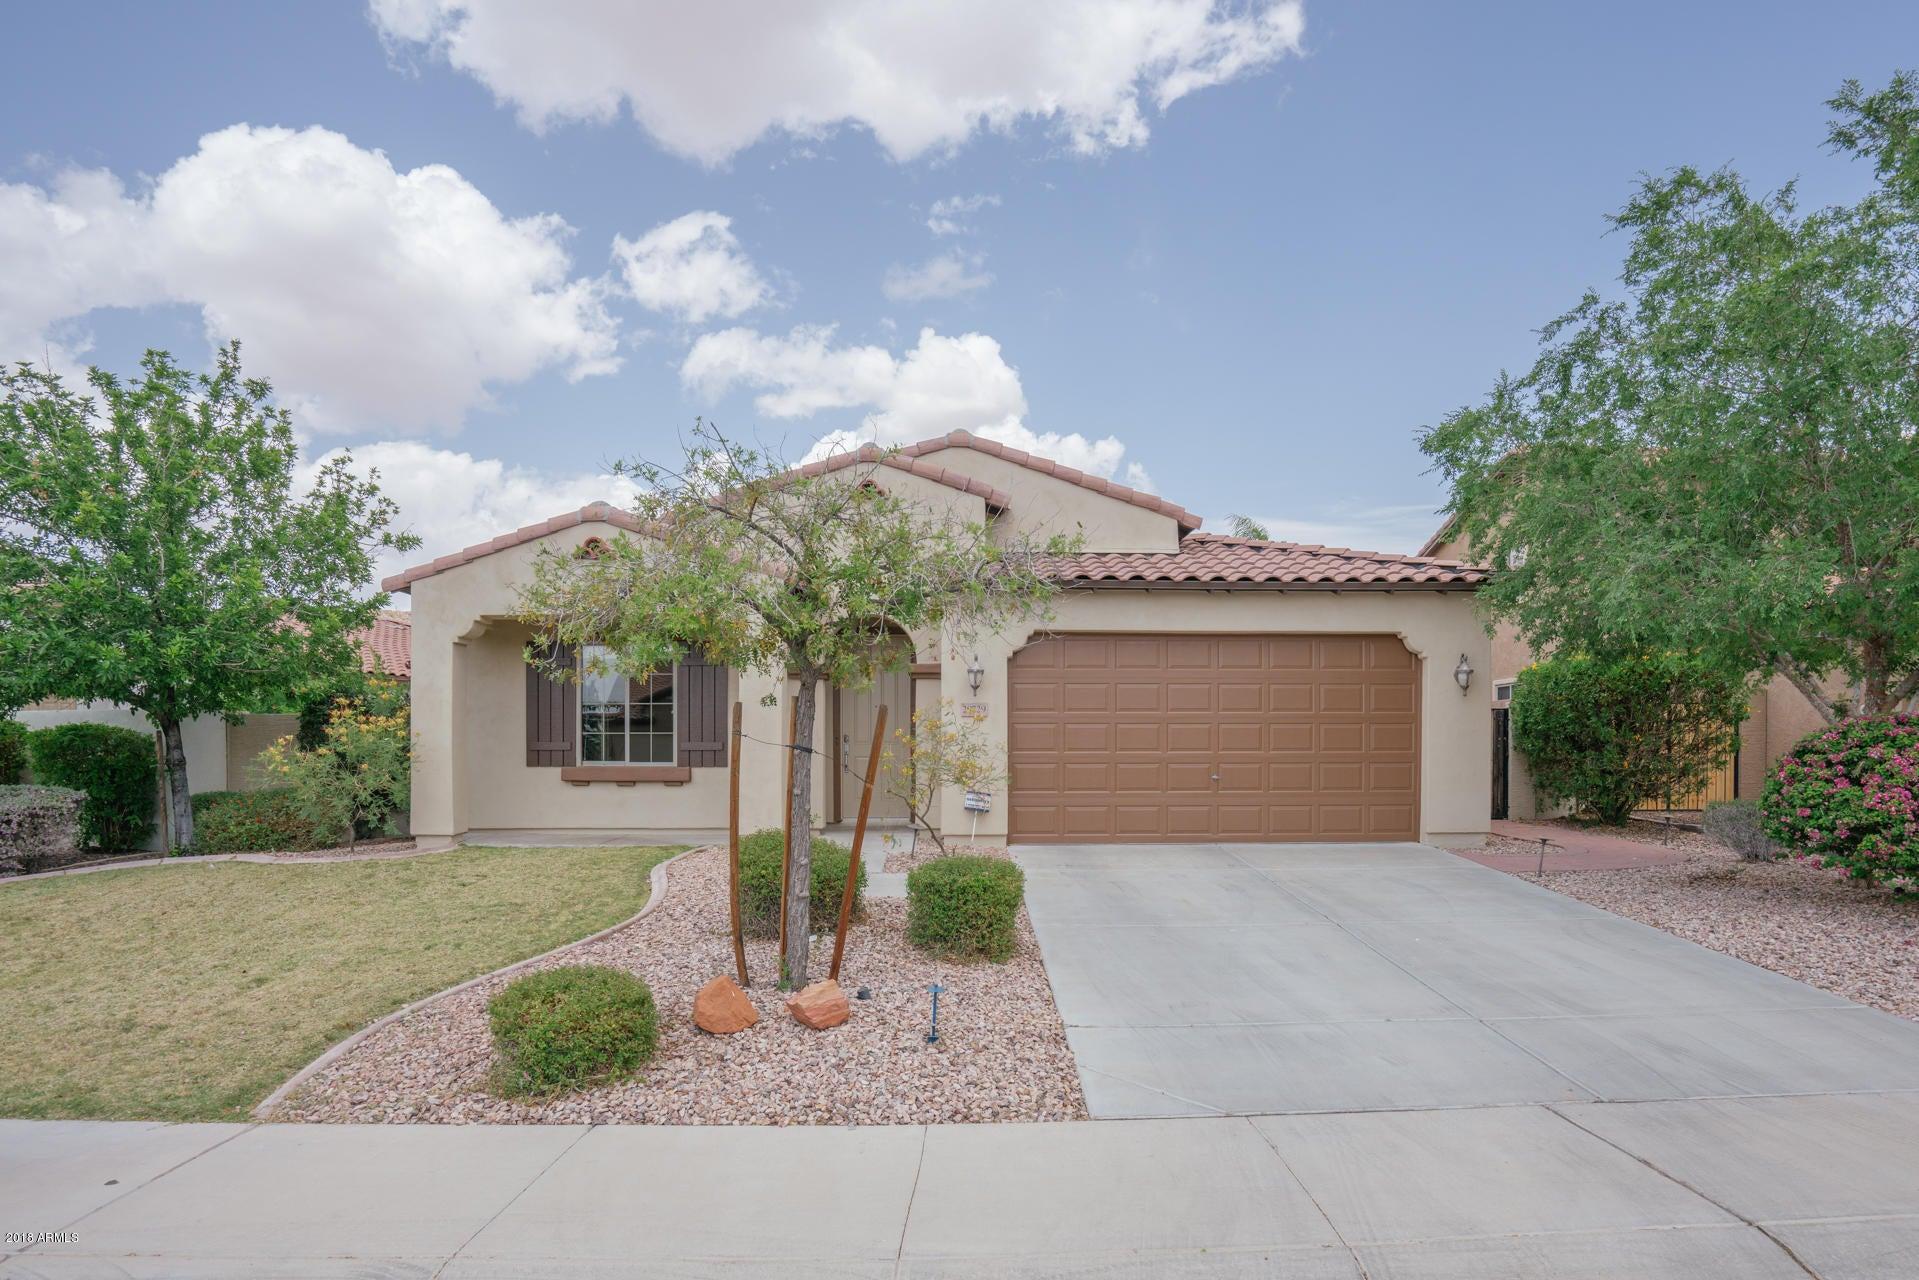 29729 N 69TH Lane, Peoria, AZ 85383